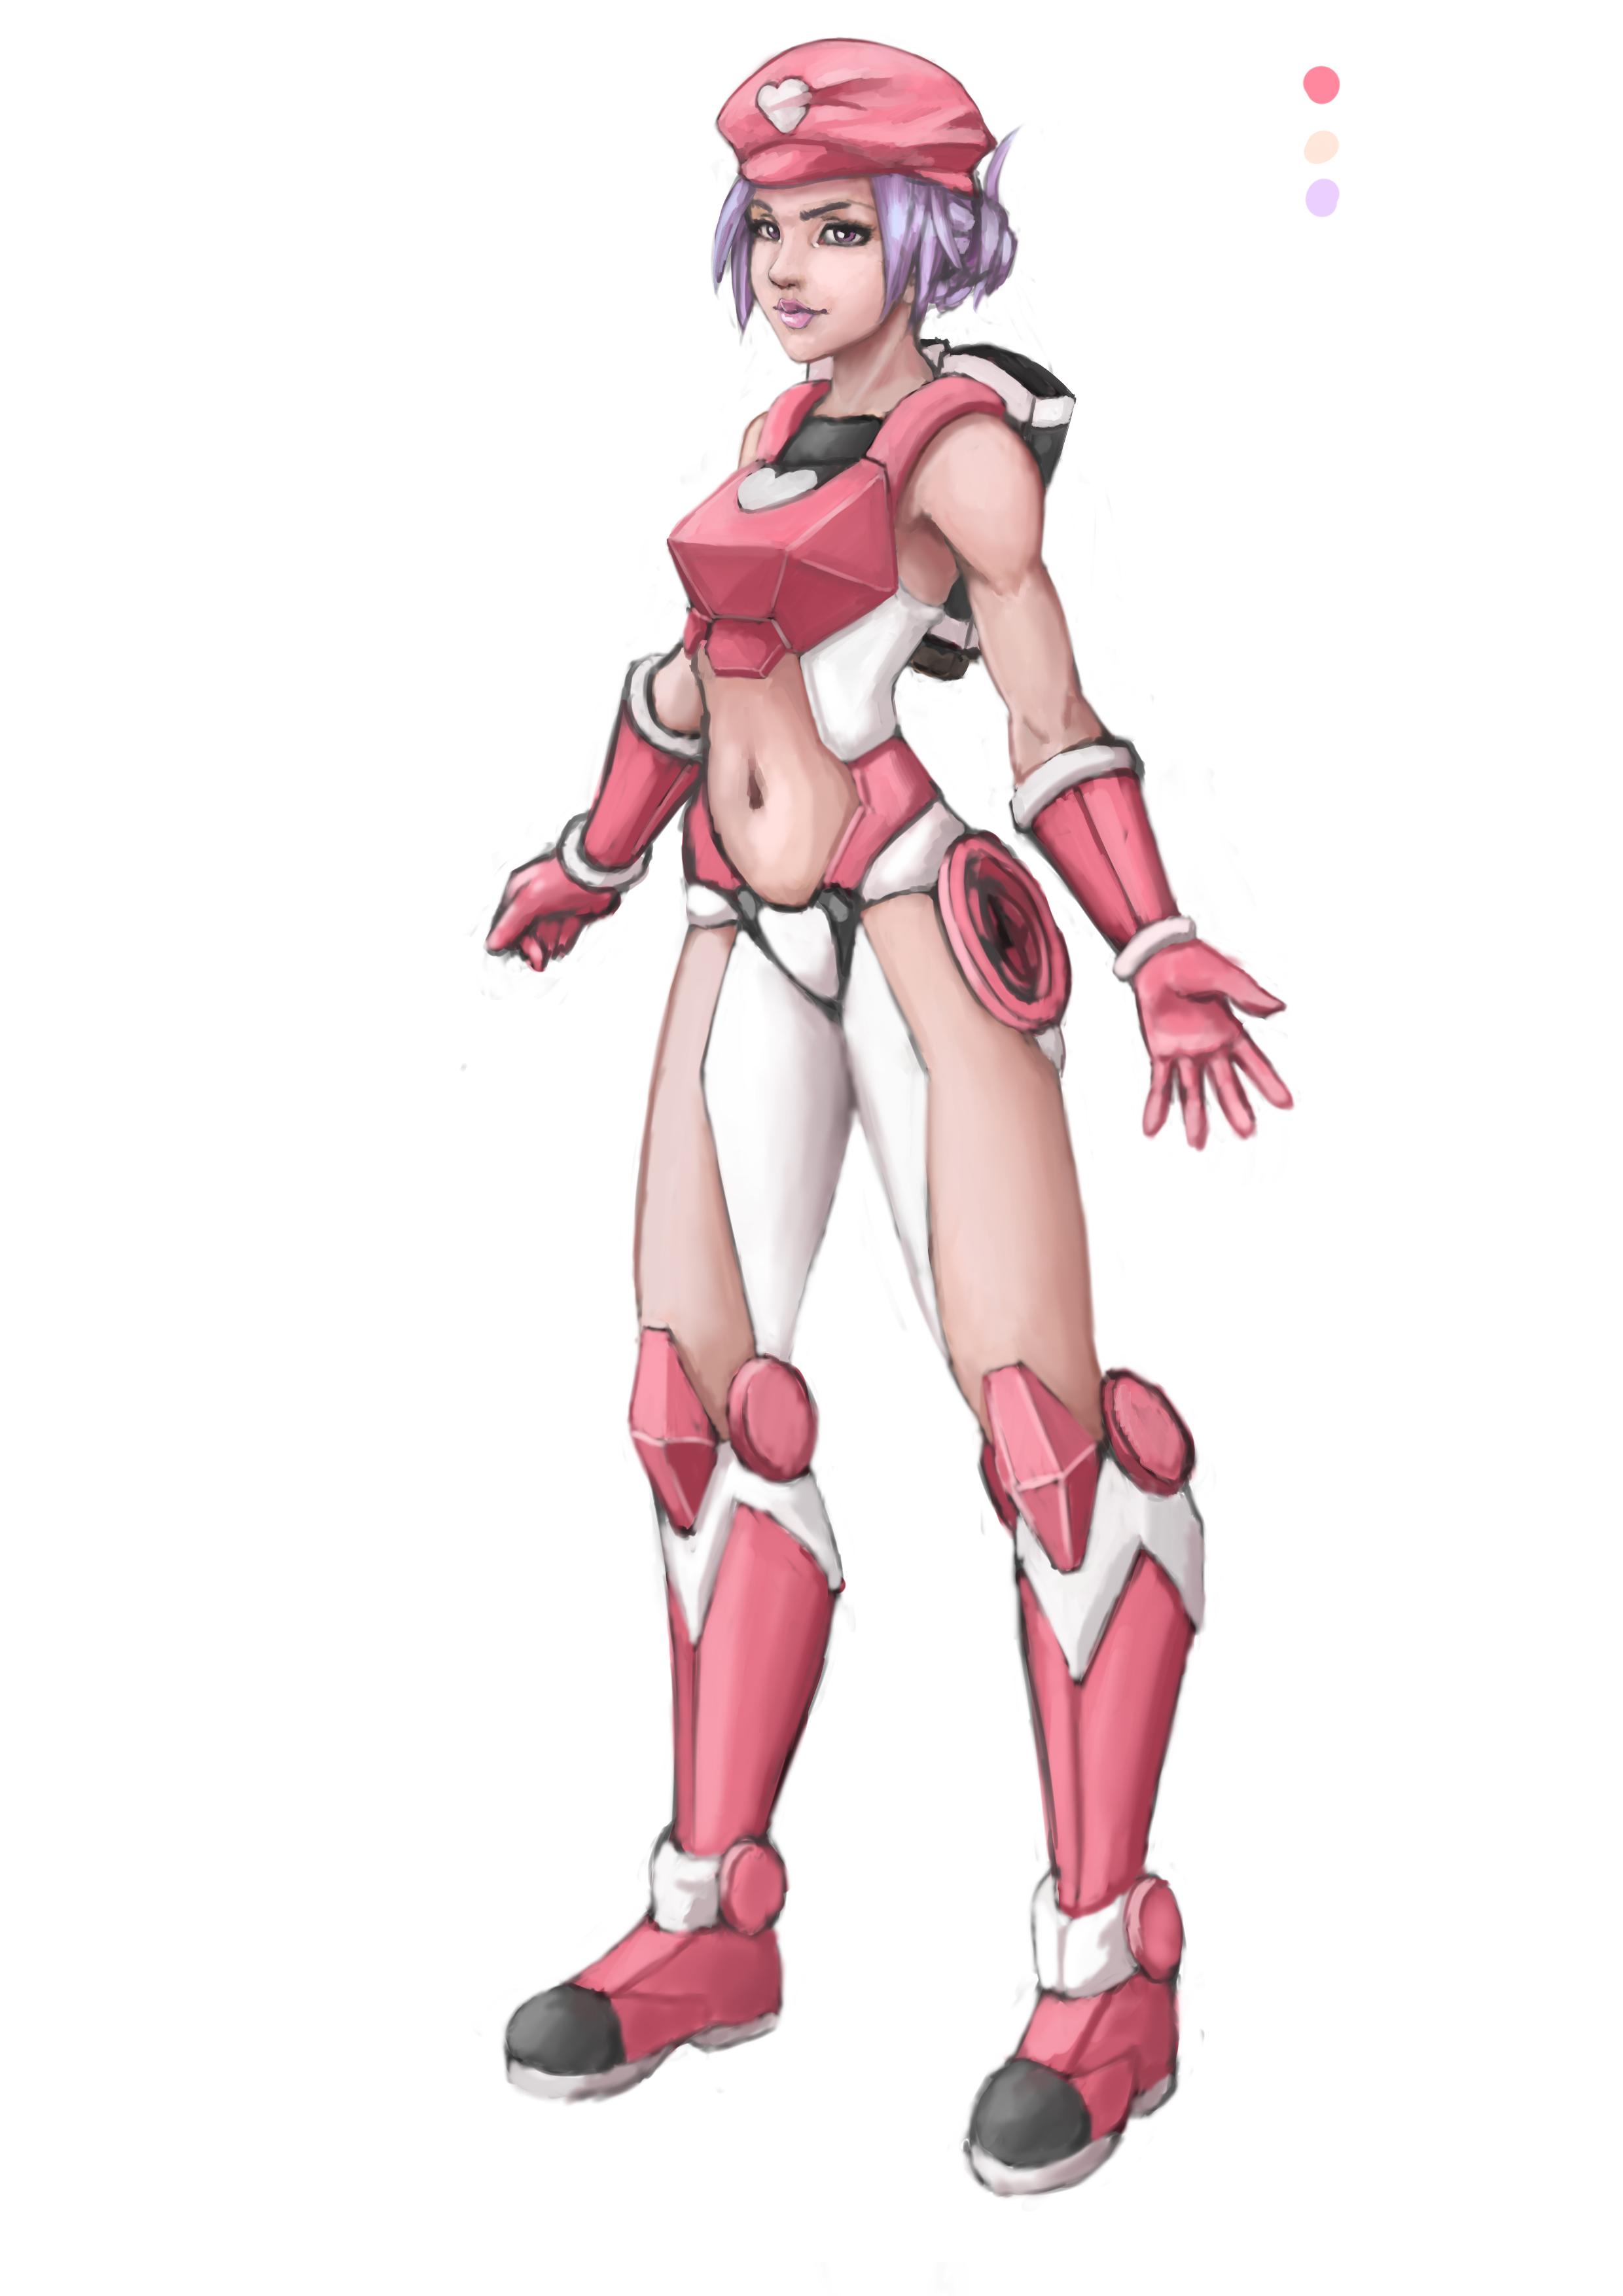 OC - Ame Kaminari - v. sci-fi